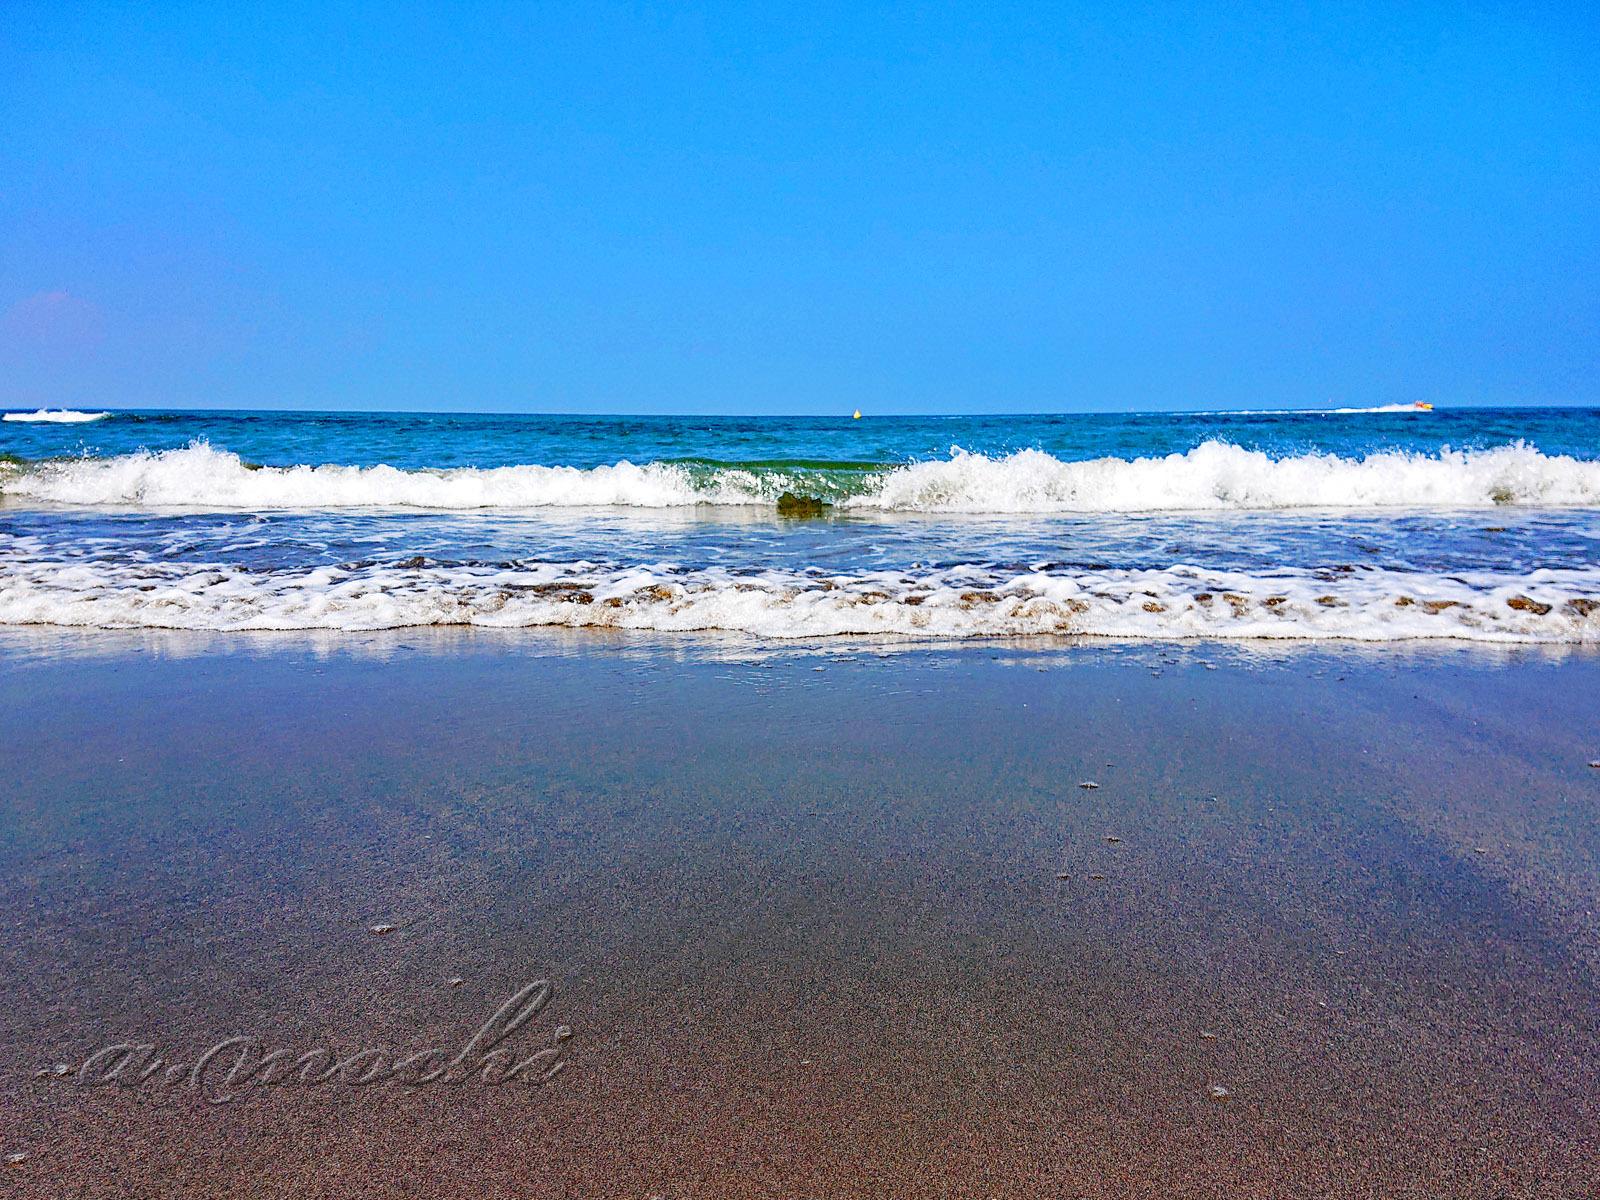 aoshima_coast.jpg